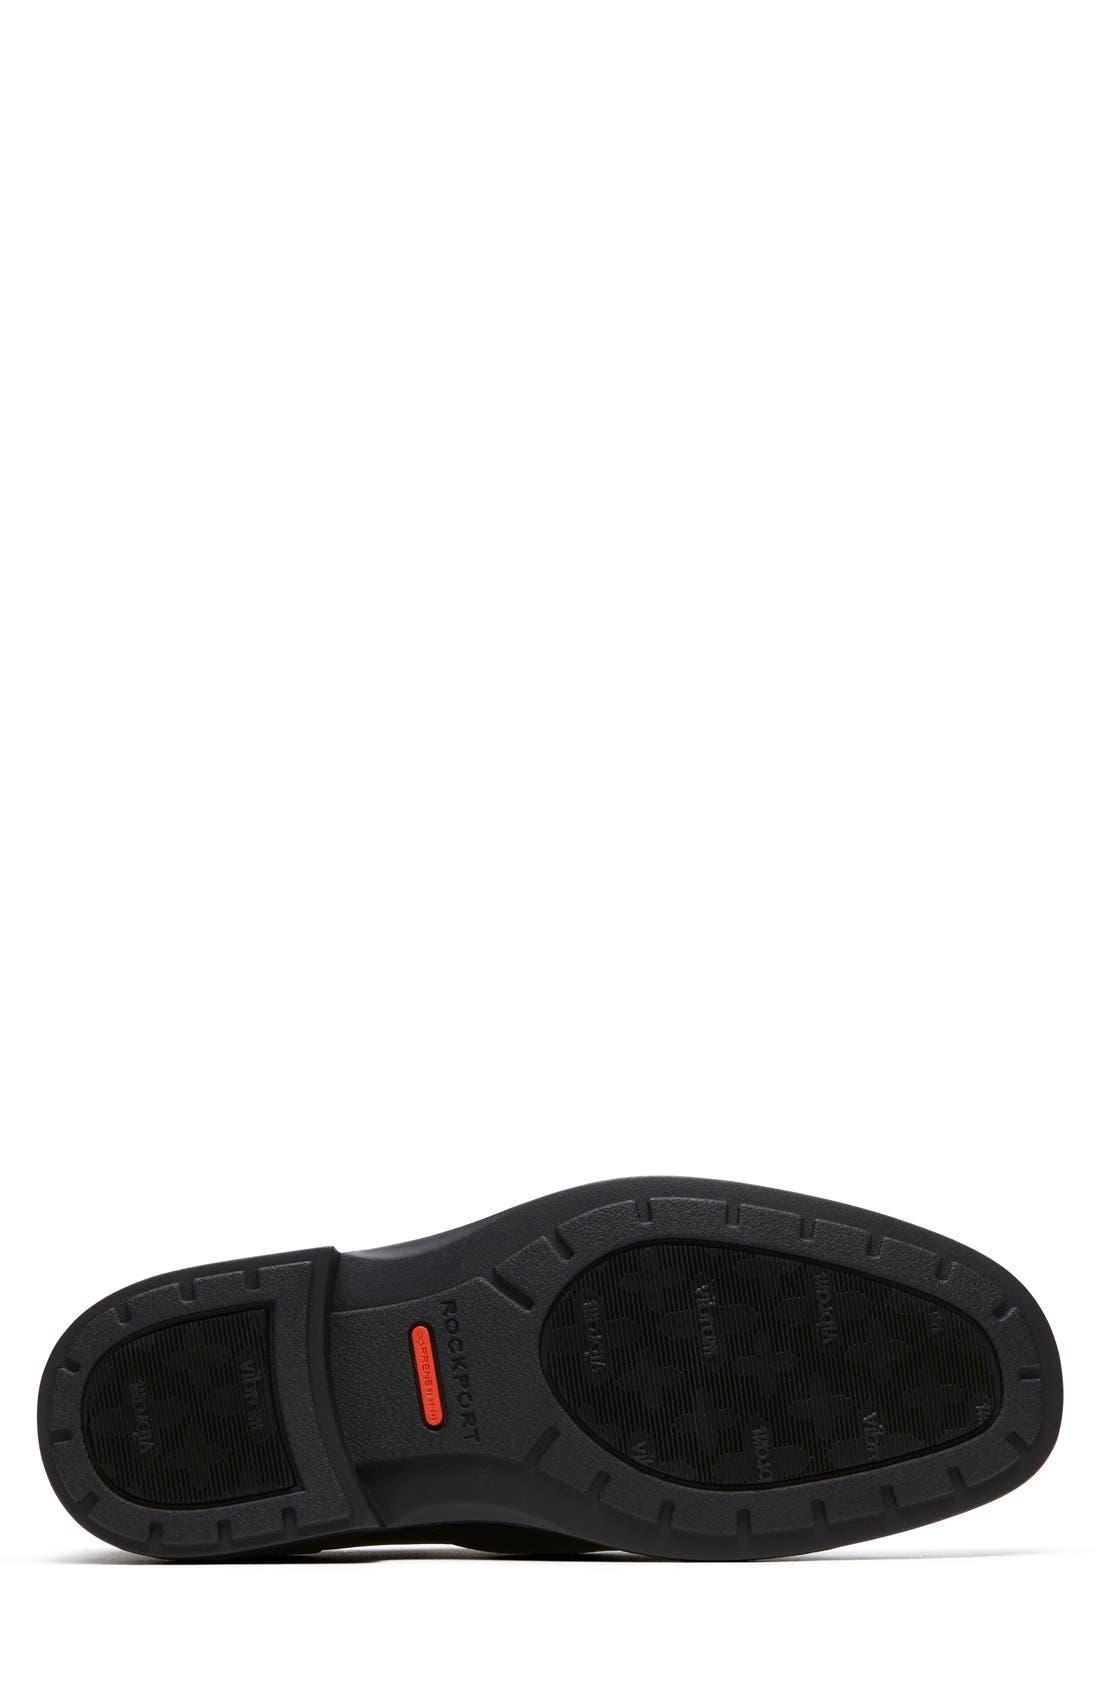 DresSports Luxe Bike Toe Slip-On,                             Alternate thumbnail 4, color,                             Black